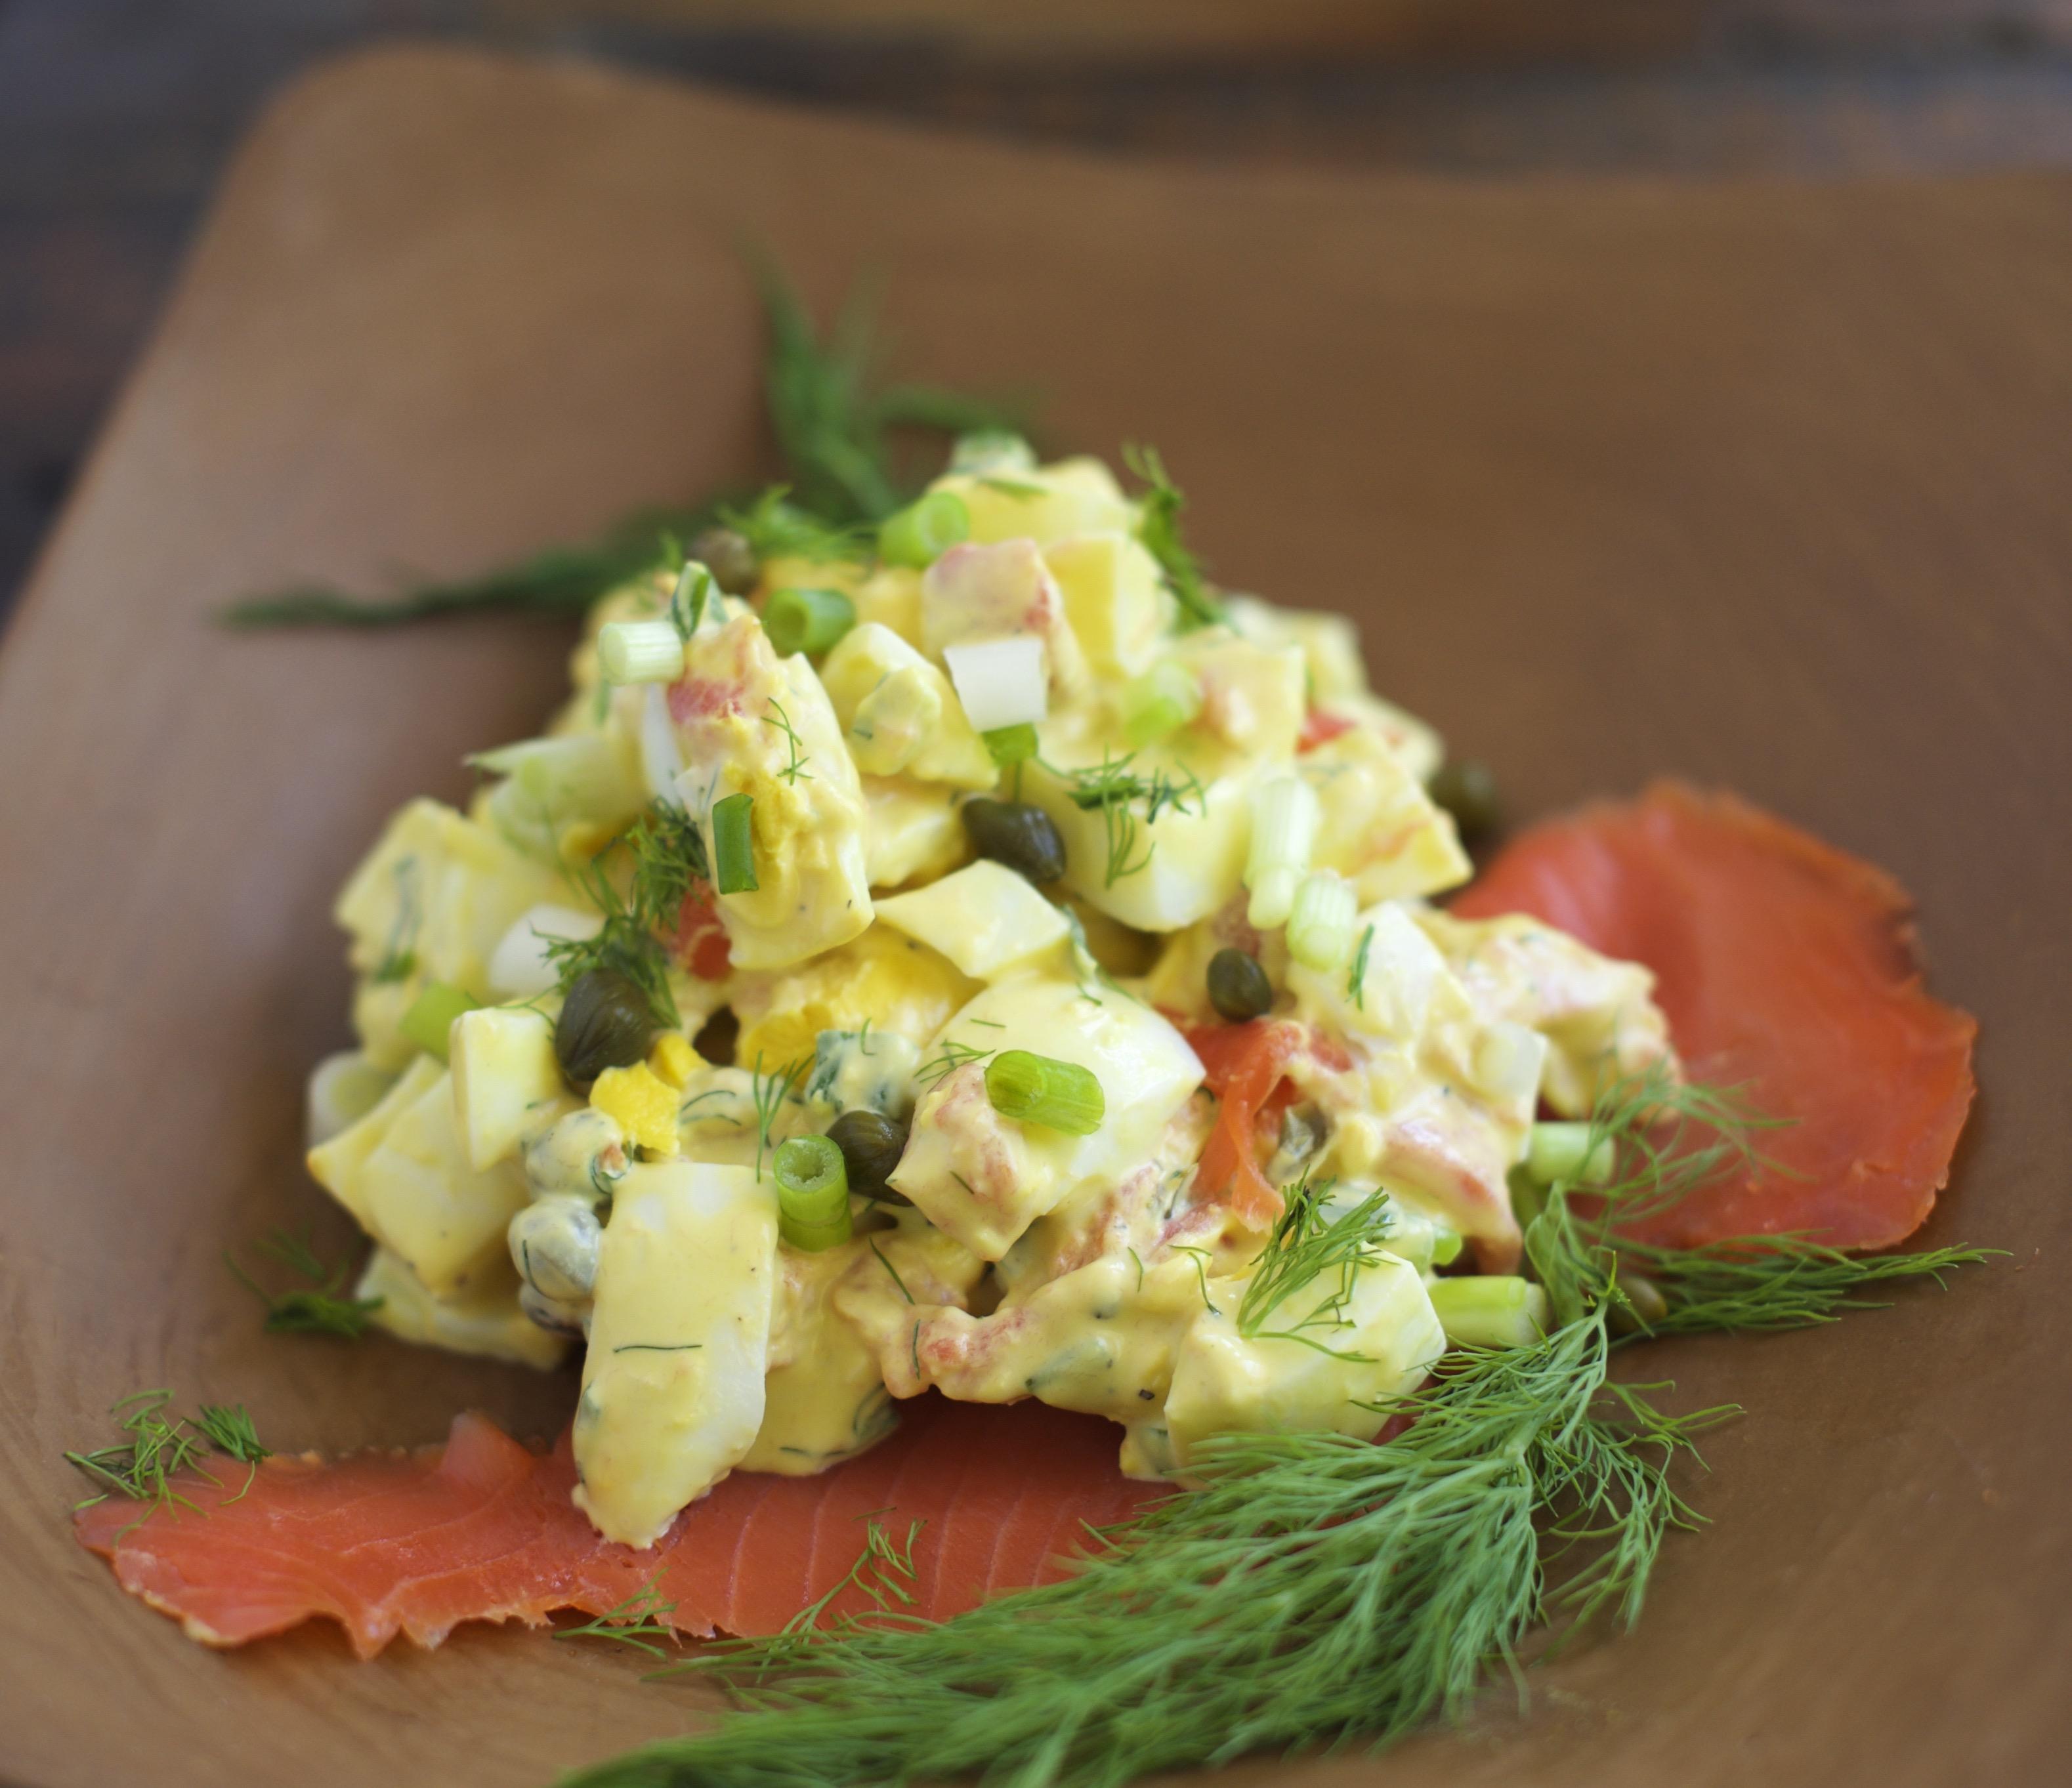 Excellent Egg Recipes for Spring